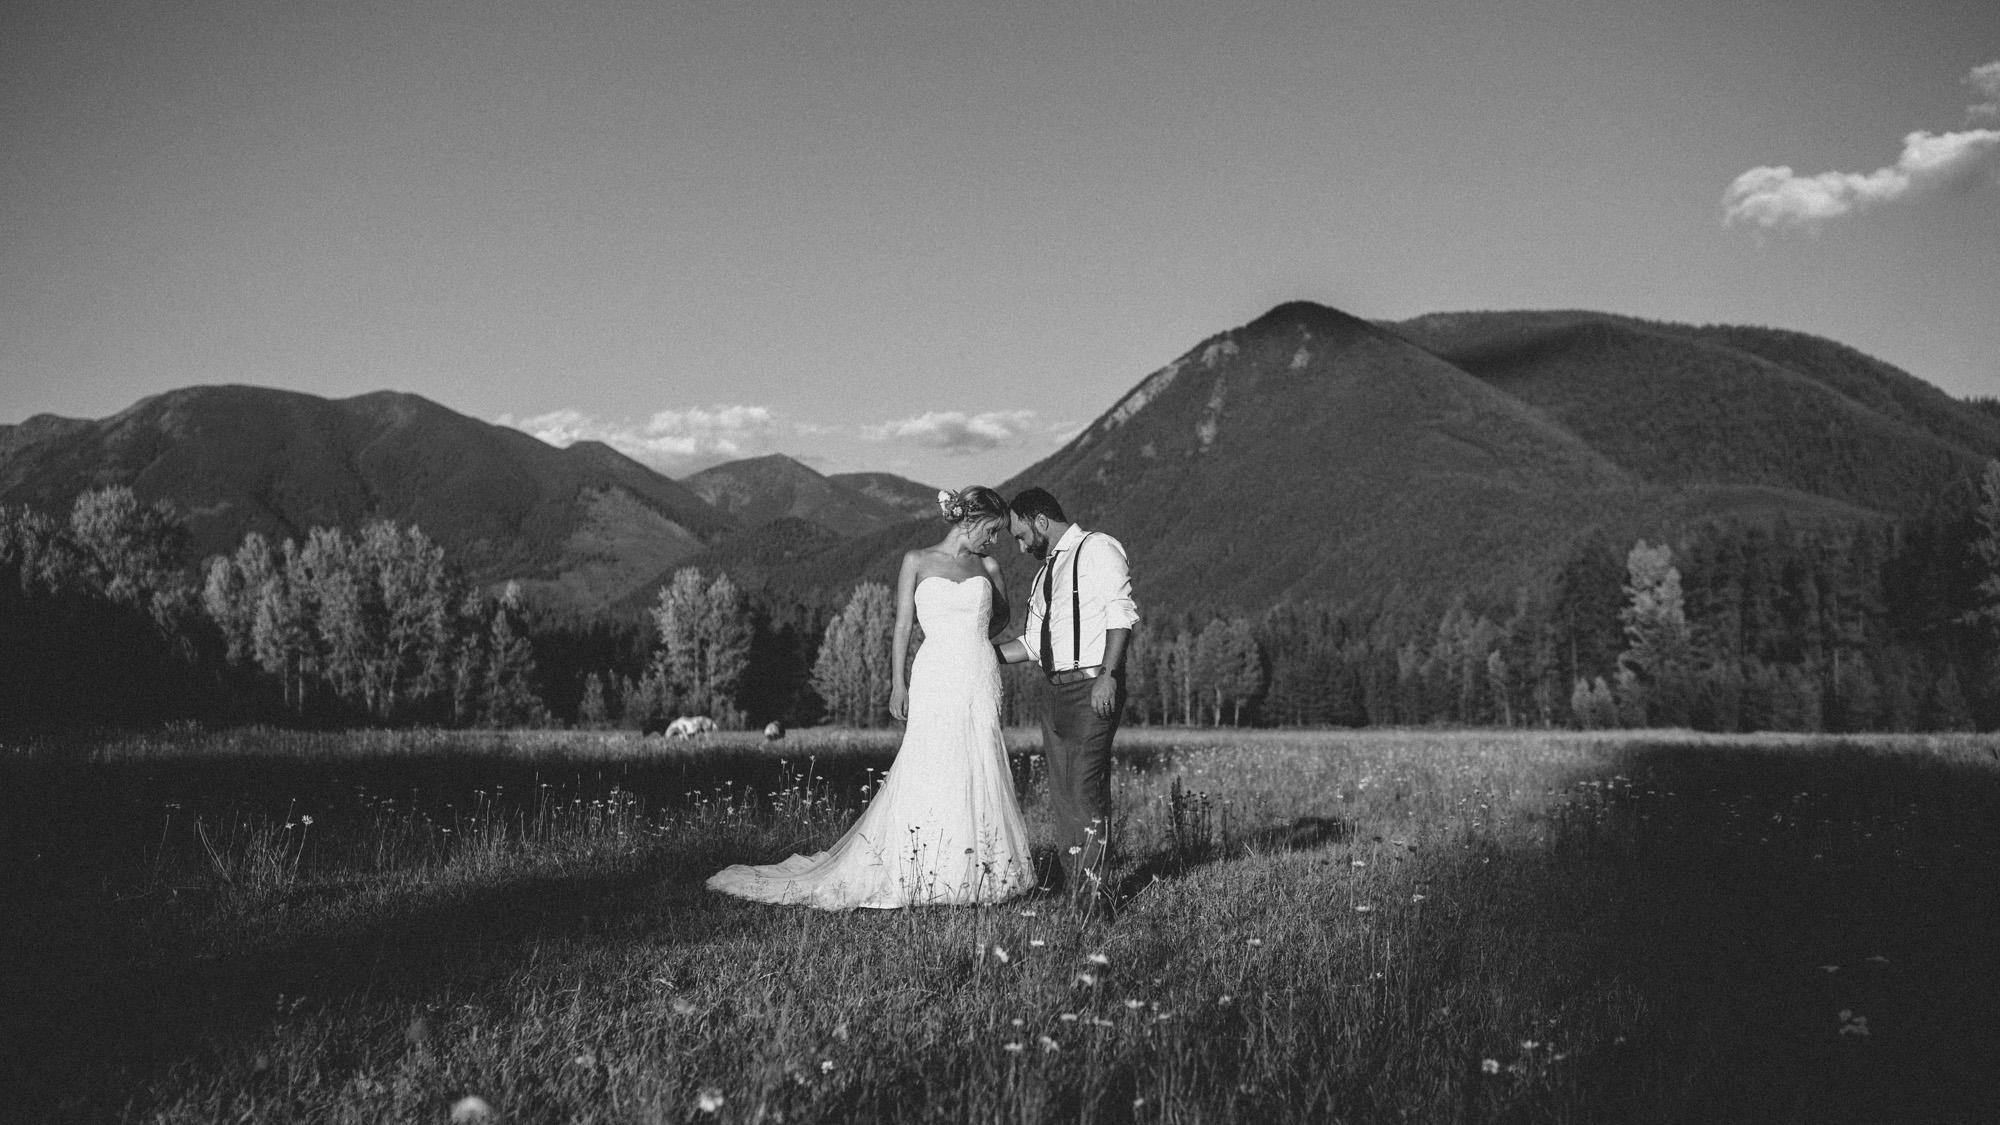 Montana_Wedding_Photos_alec_vanderboom-0125.jpg